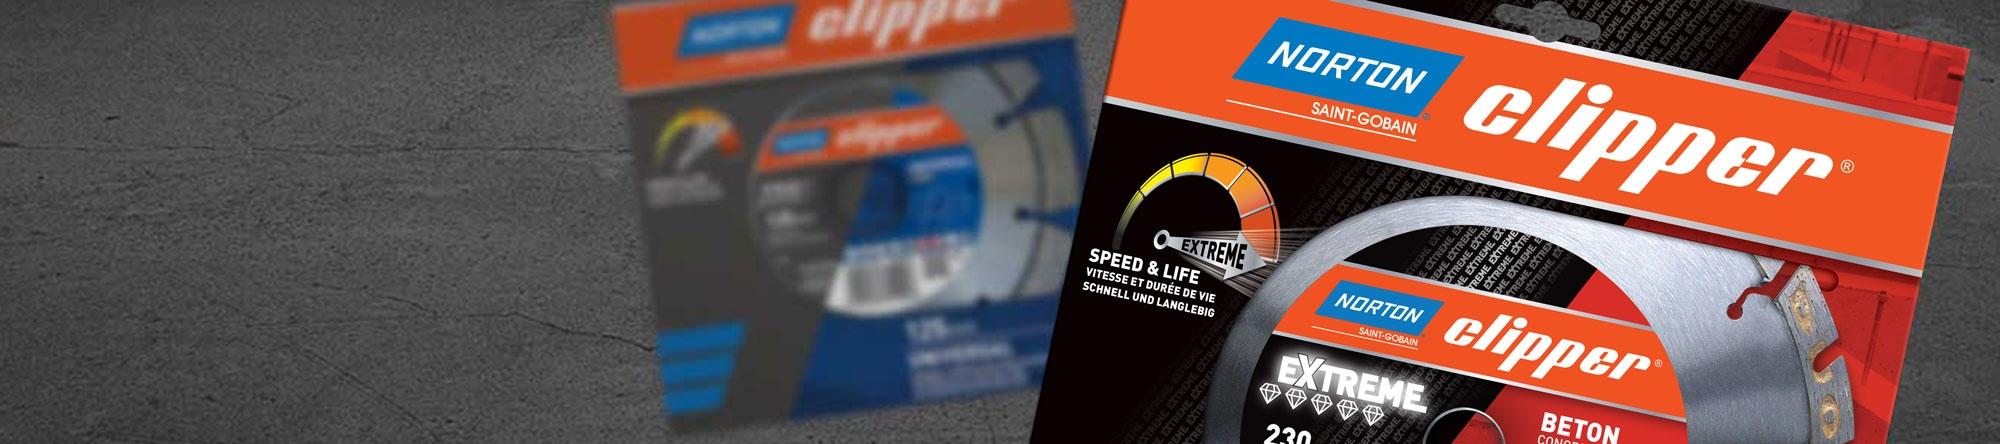 Norton Clipper Wiring Diagram Diagrams Building Construction Abrasives Rh Nortonabrasives Com Trailer For Dummies